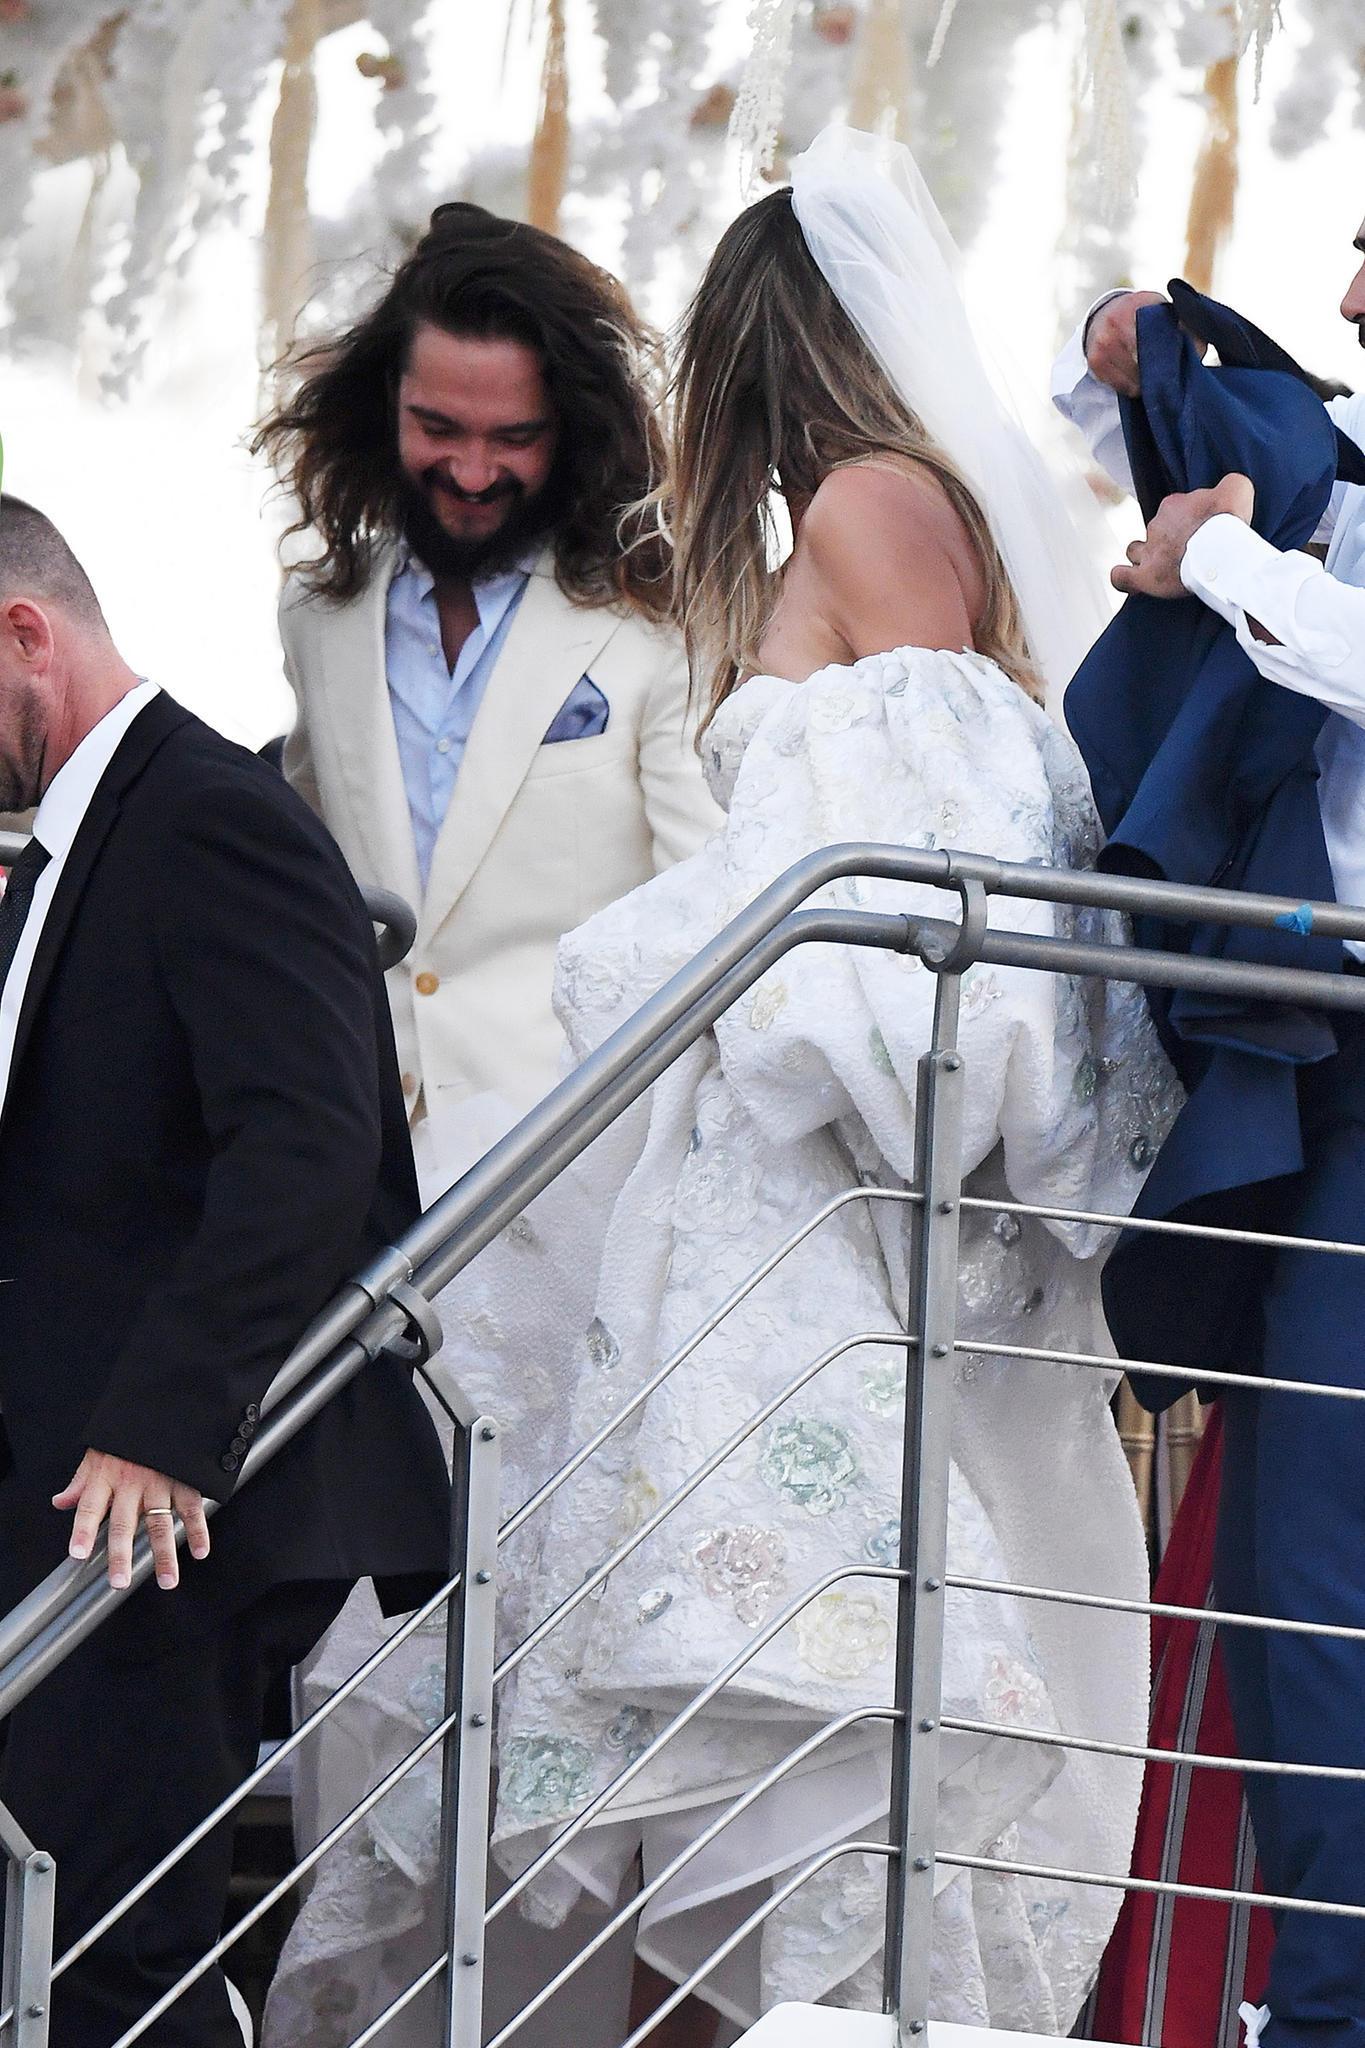 Hochzeit Mit Heidi Klum So Feierte Tom Kaulitz Seinen Jga